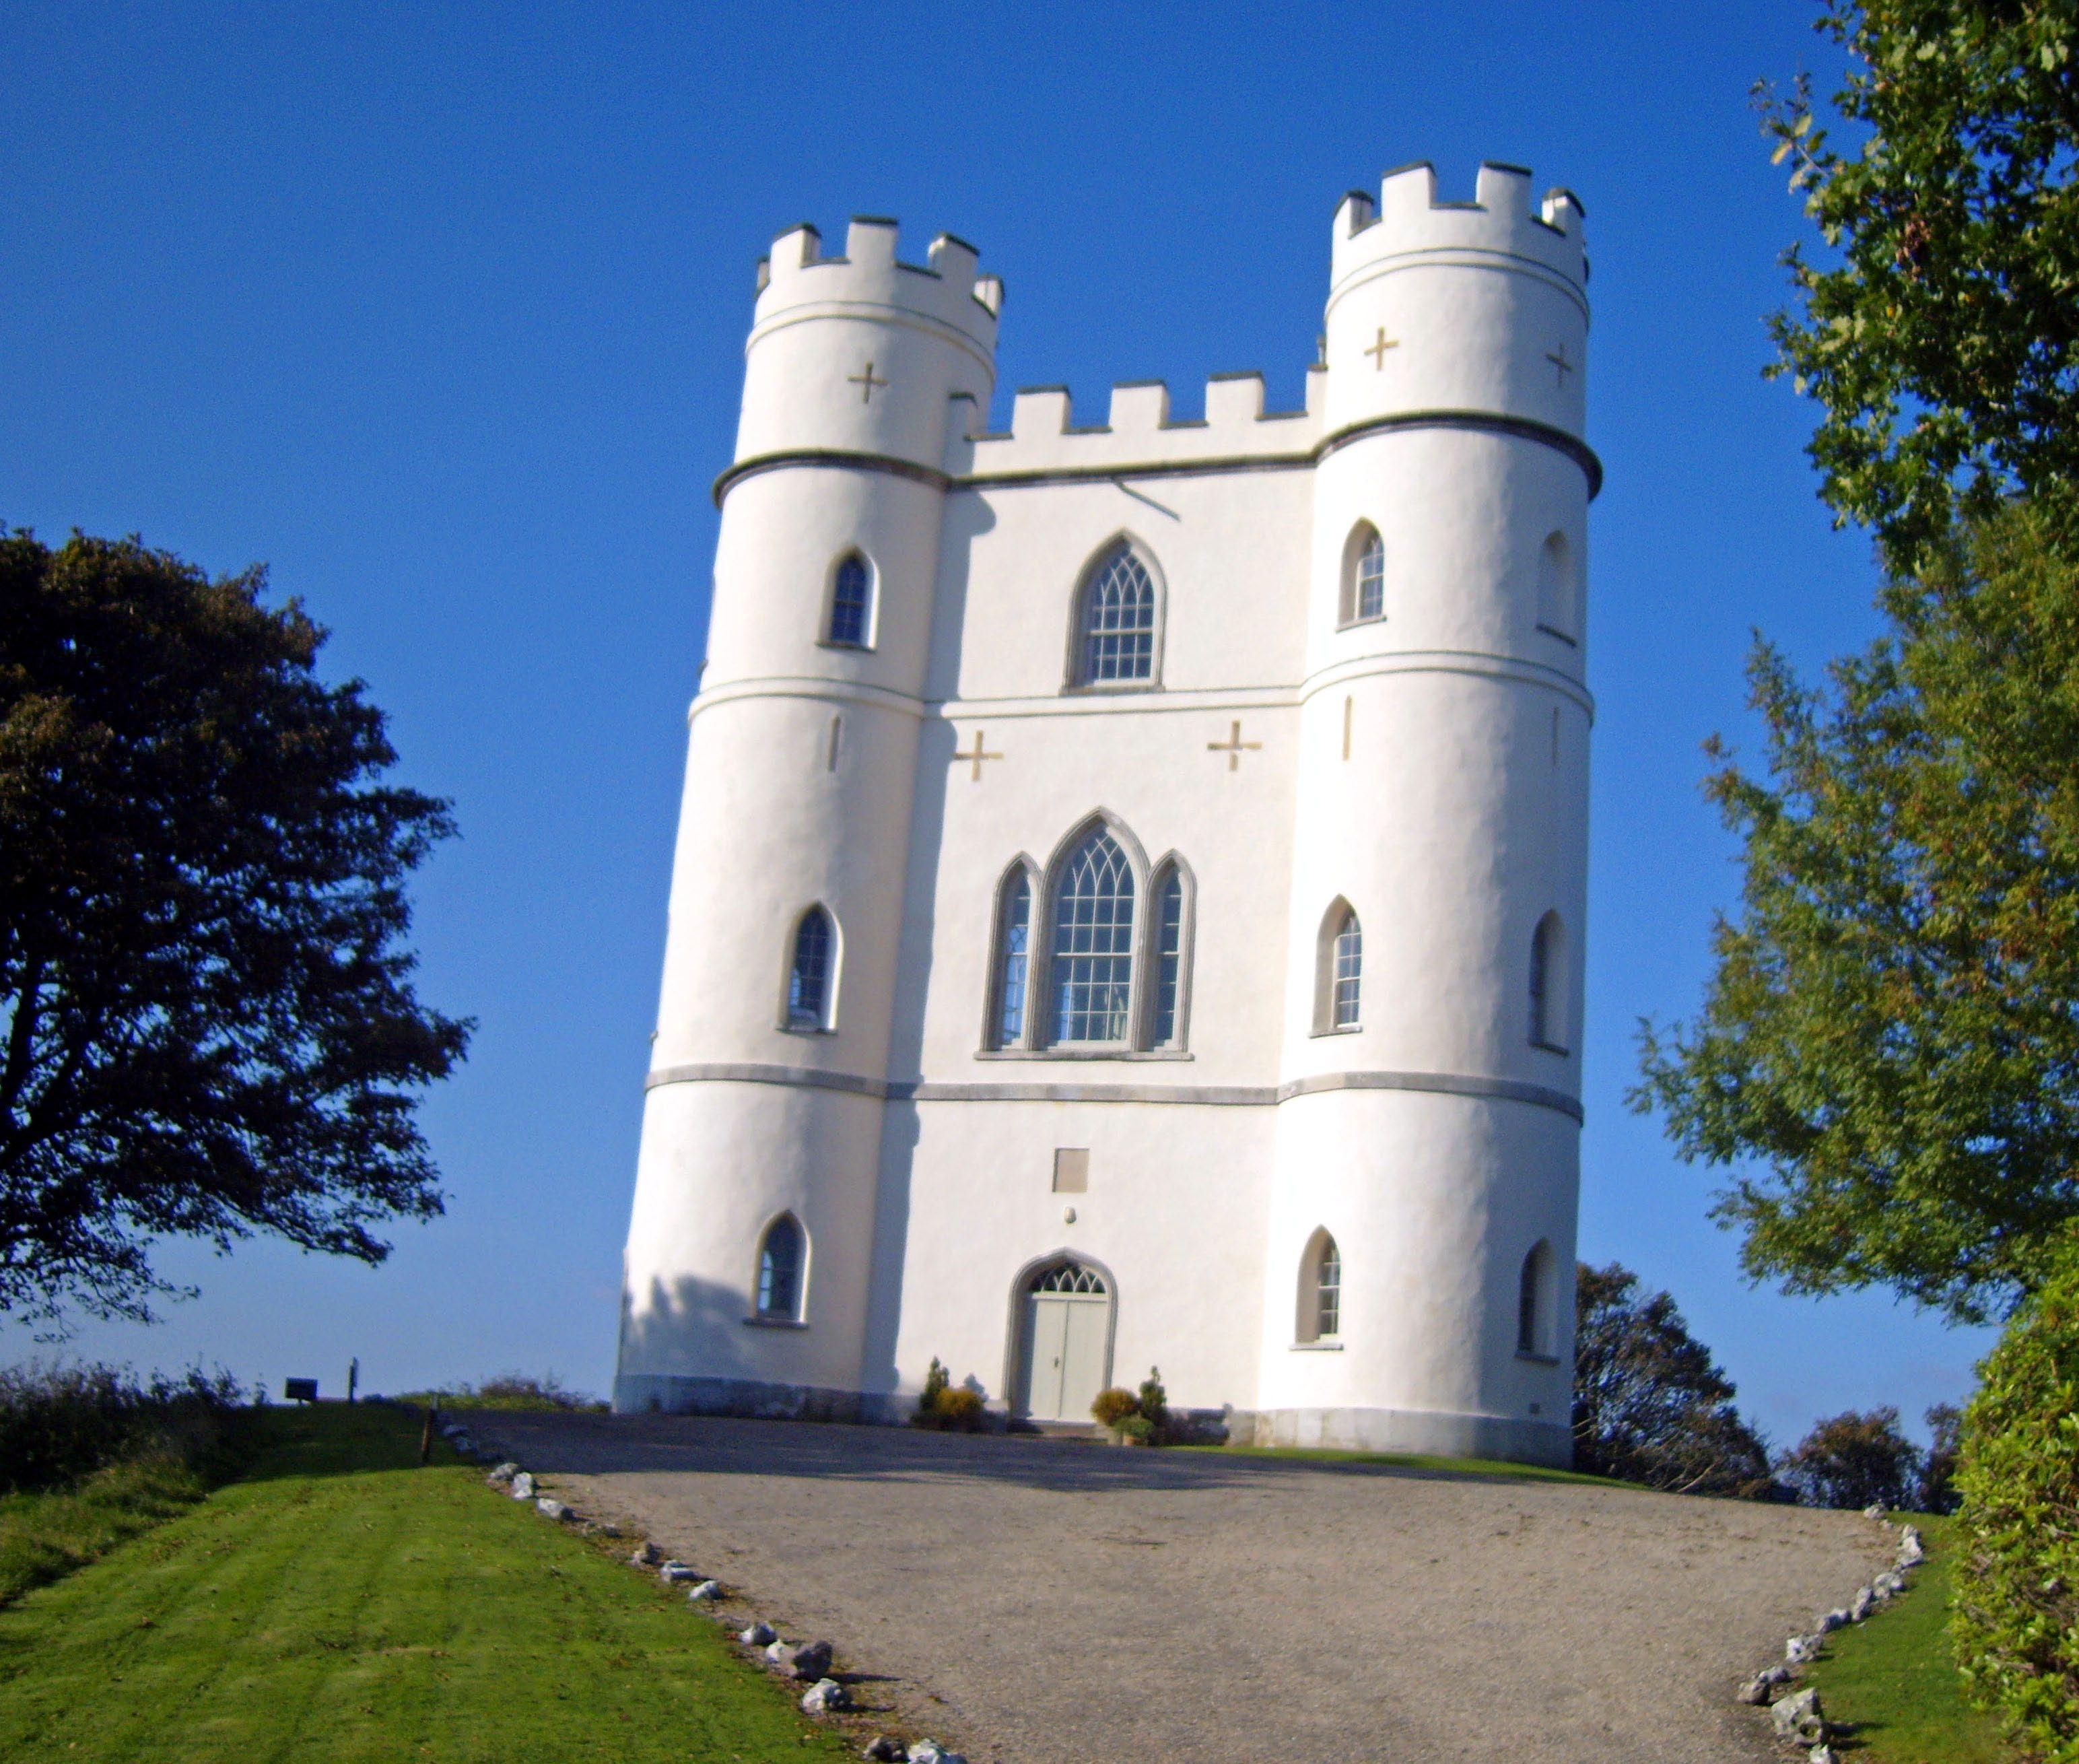 The Haldon Belvedere